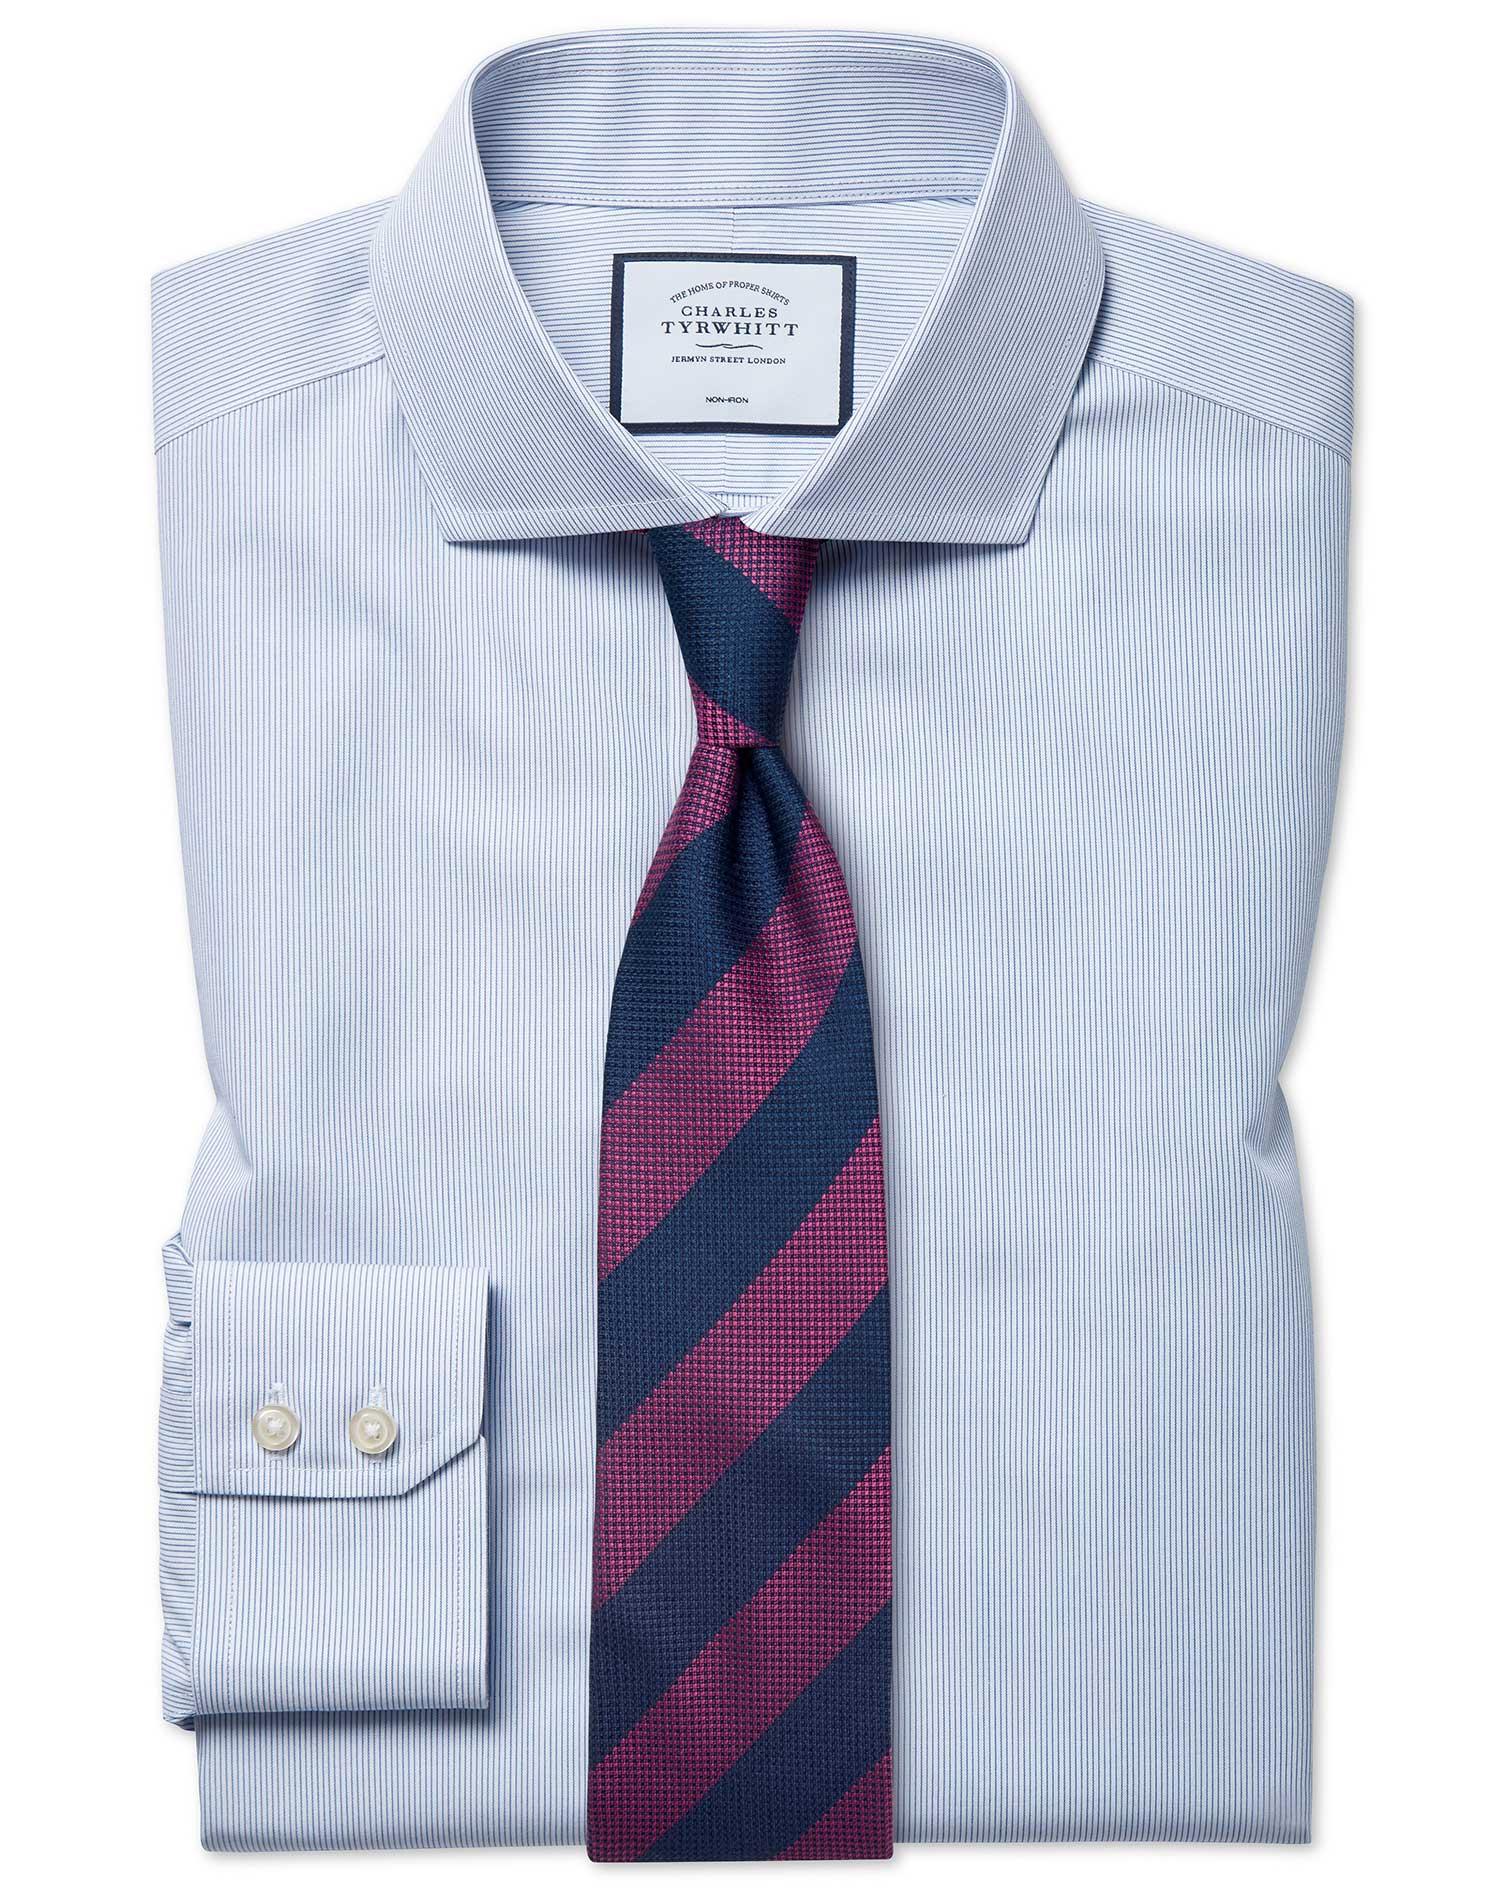 Classic Fit Non-Iron Cutaway Blue Stripe Tyrwhitt Cool Cotton Formal Shirt Single Cuff Size 15/35 by